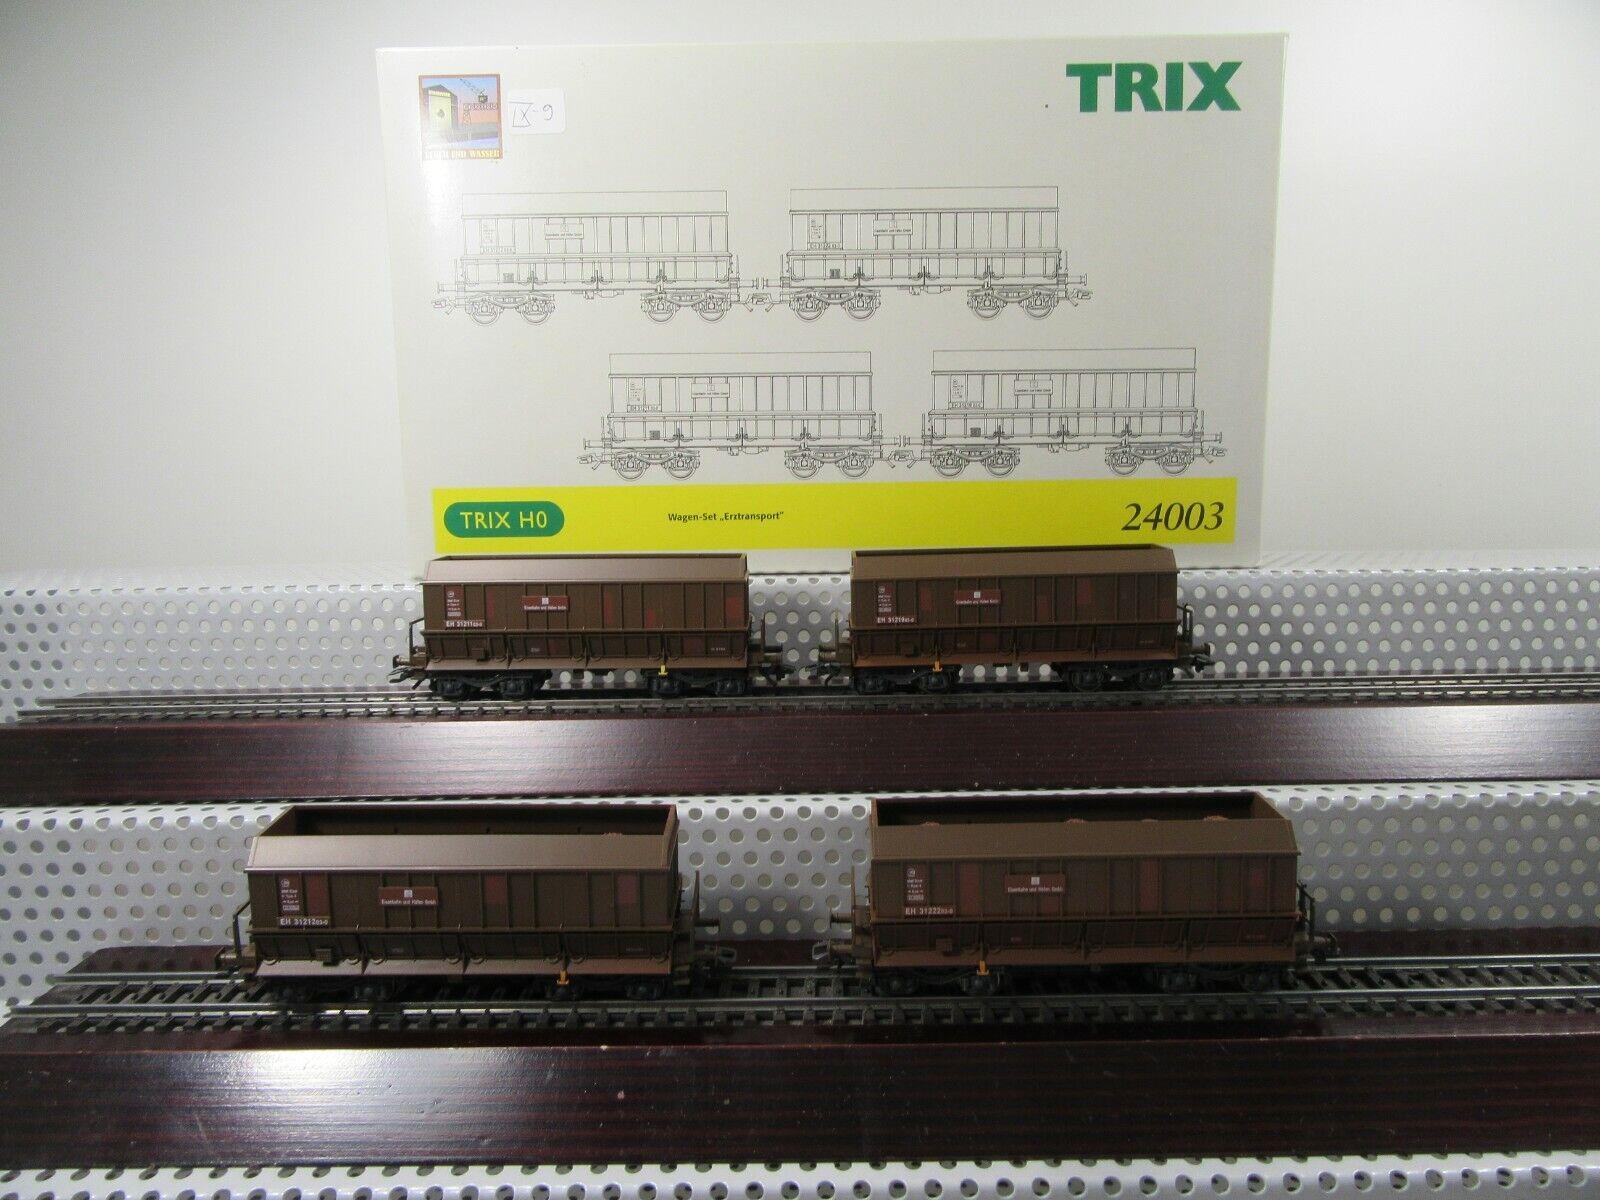 Trix h0 24003 coches-set  erztransport  E y H GmbH época V 4 piezas en OVP